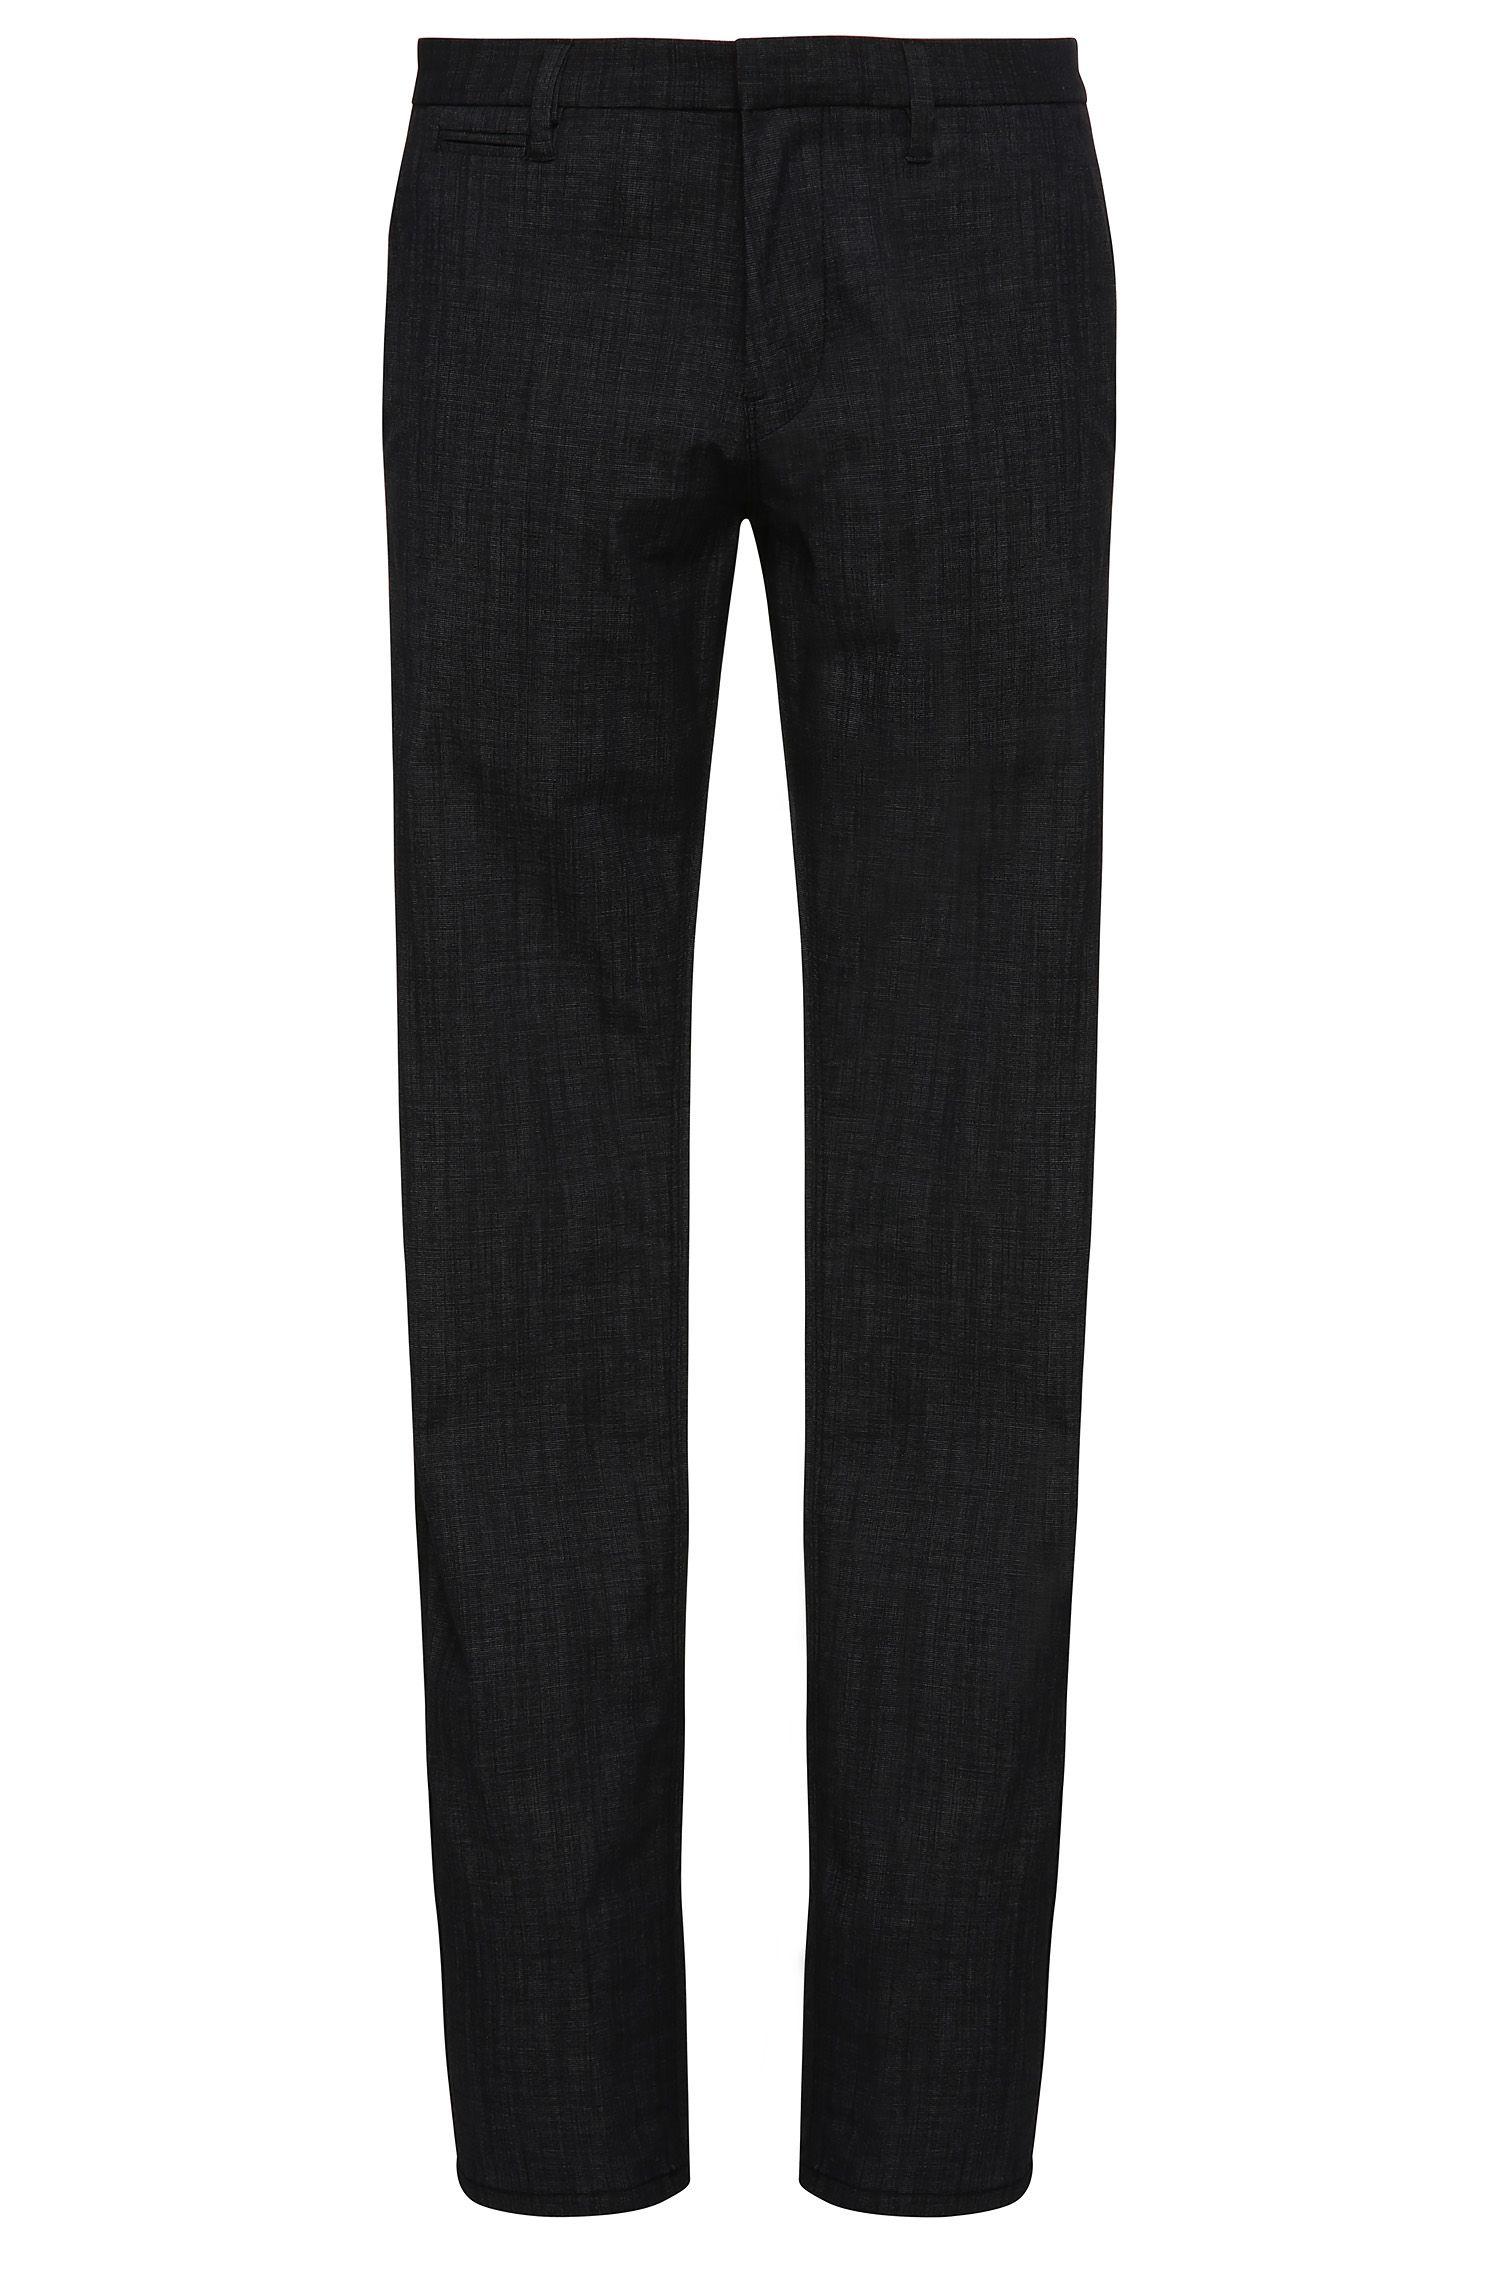 'Schino Slim W' | Slim Fit, Stretch Cotton Blend Trousers